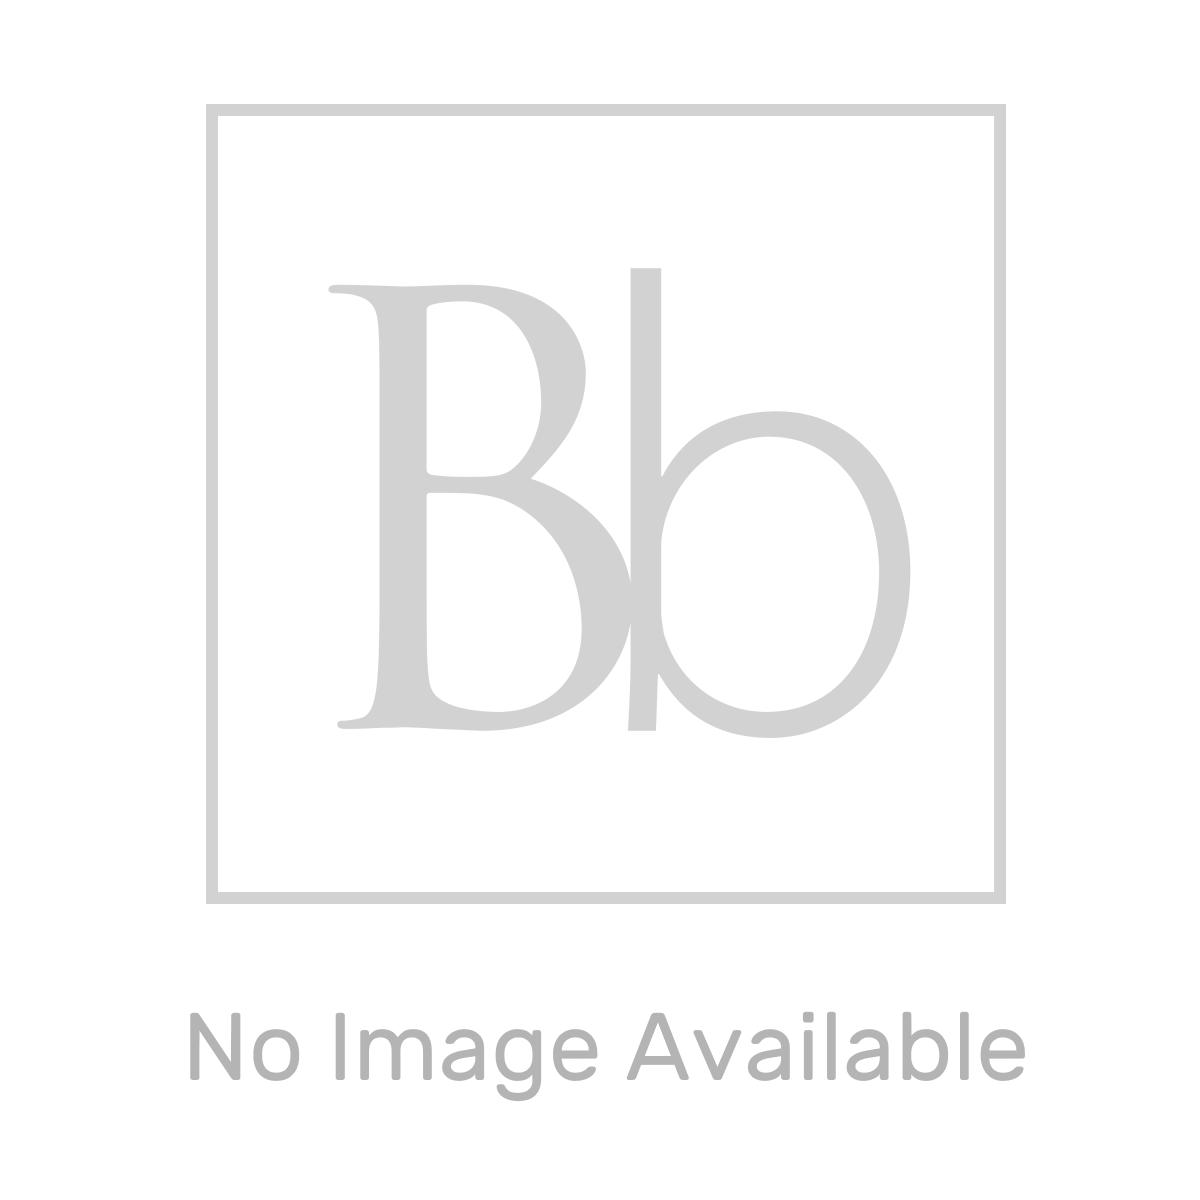 Elation Compact Combination L Shape Indigo Matt Furniture Pack 920mm Dimensions